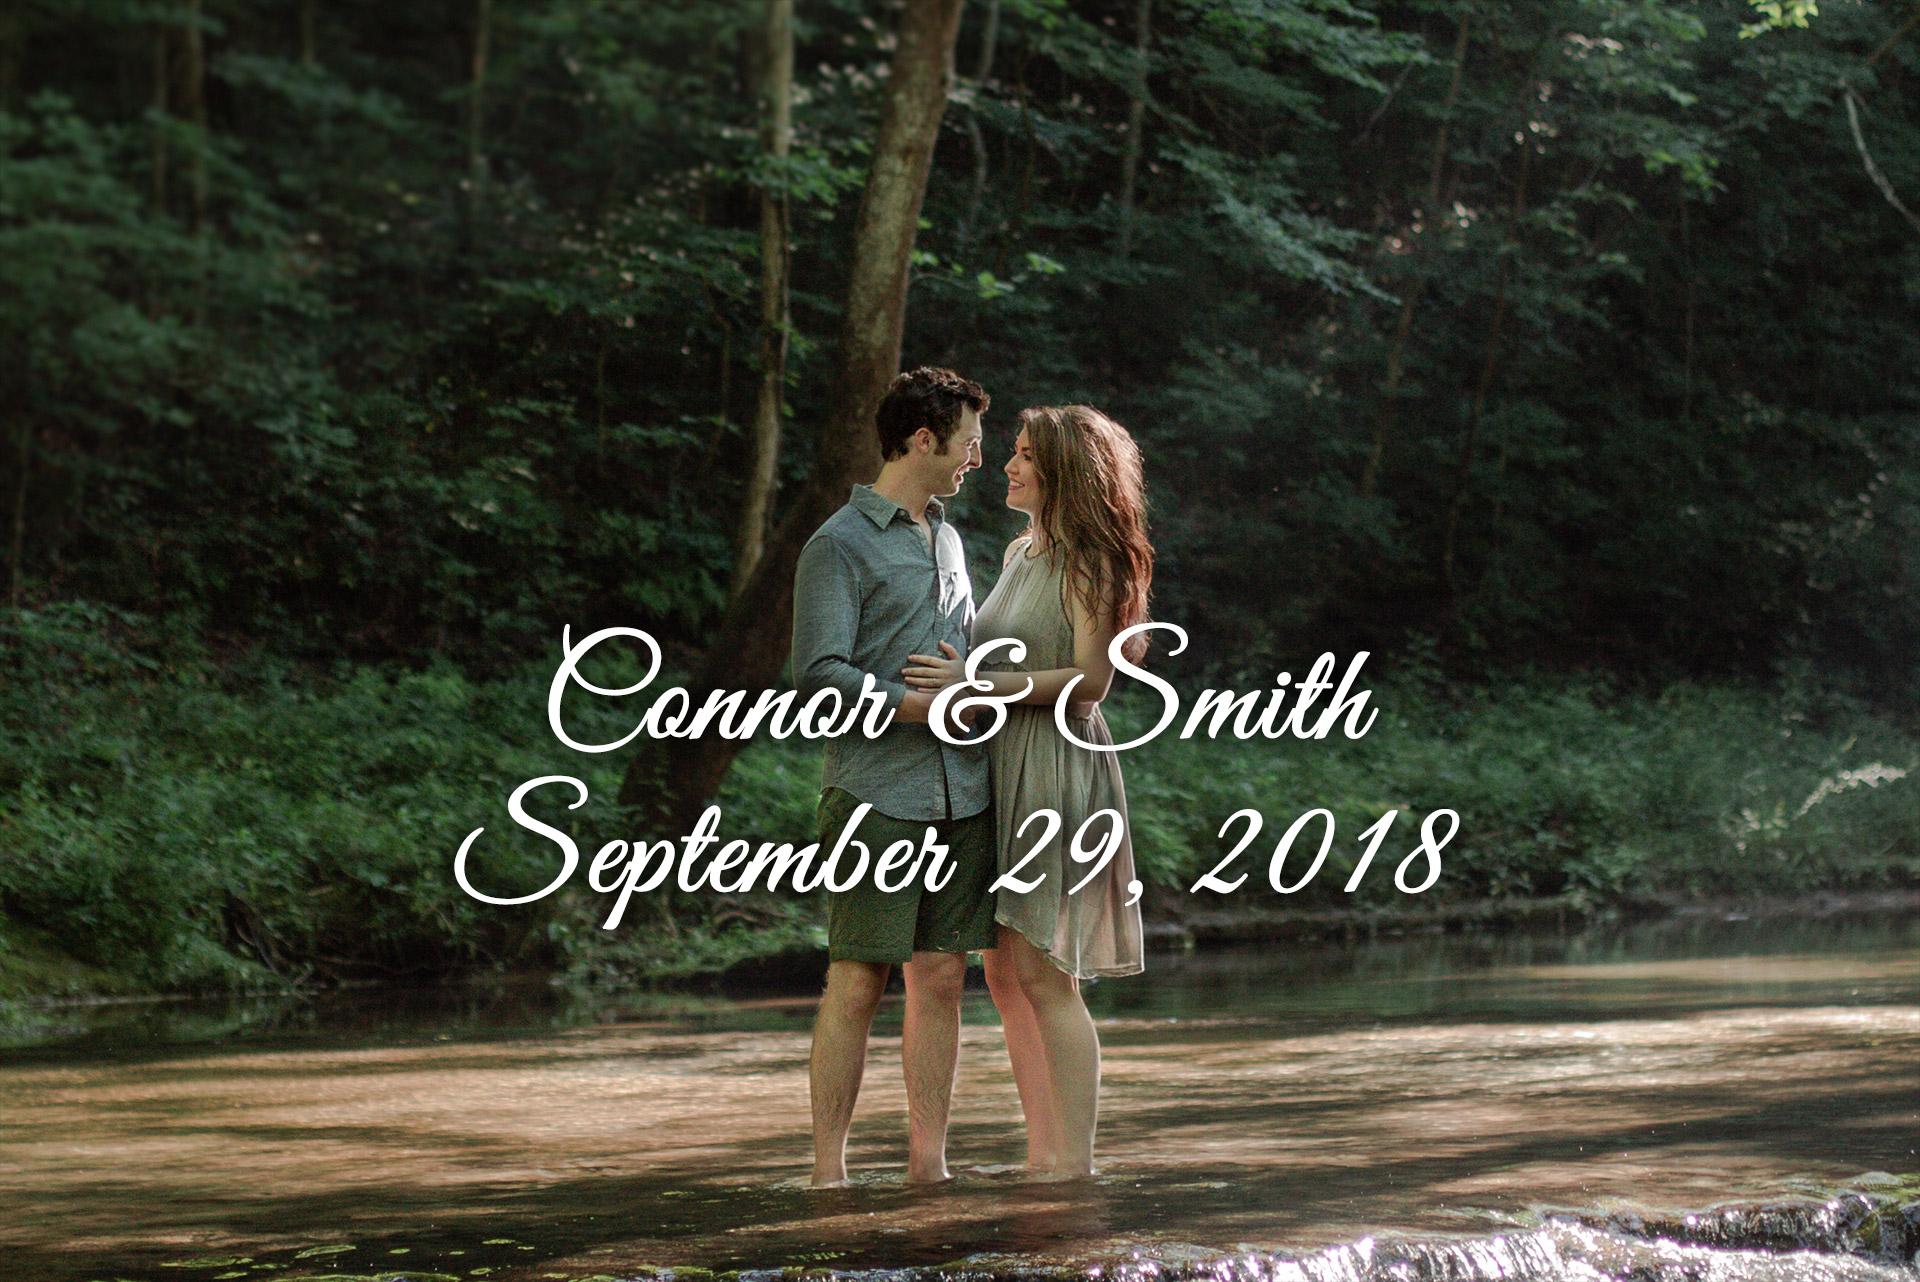 Connor-Smith Remnant Fellowship Wedding